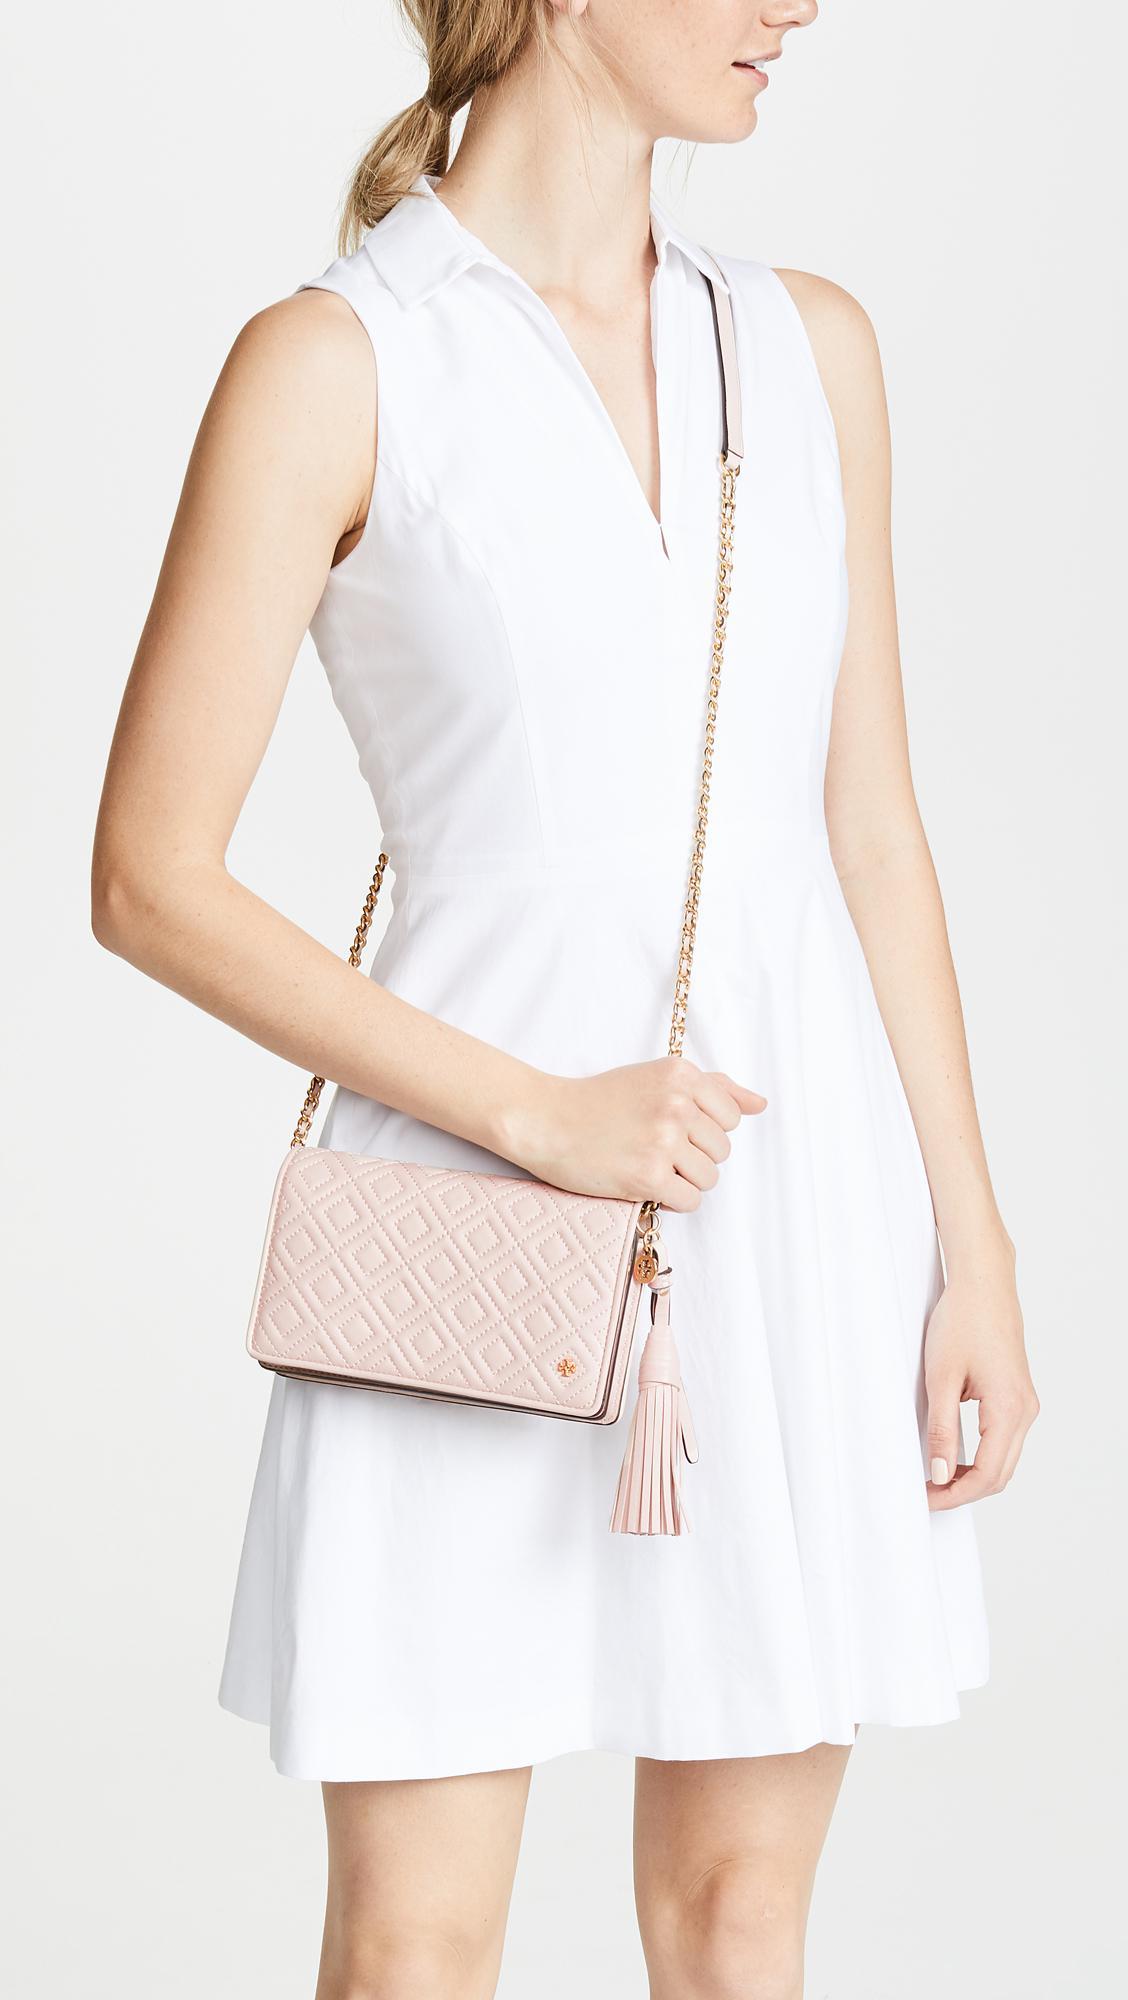 579ce04f255a1 Tory Burch - Pink Fleming Flat Wallet Cross Body Bag - Lyst. View fullscreen